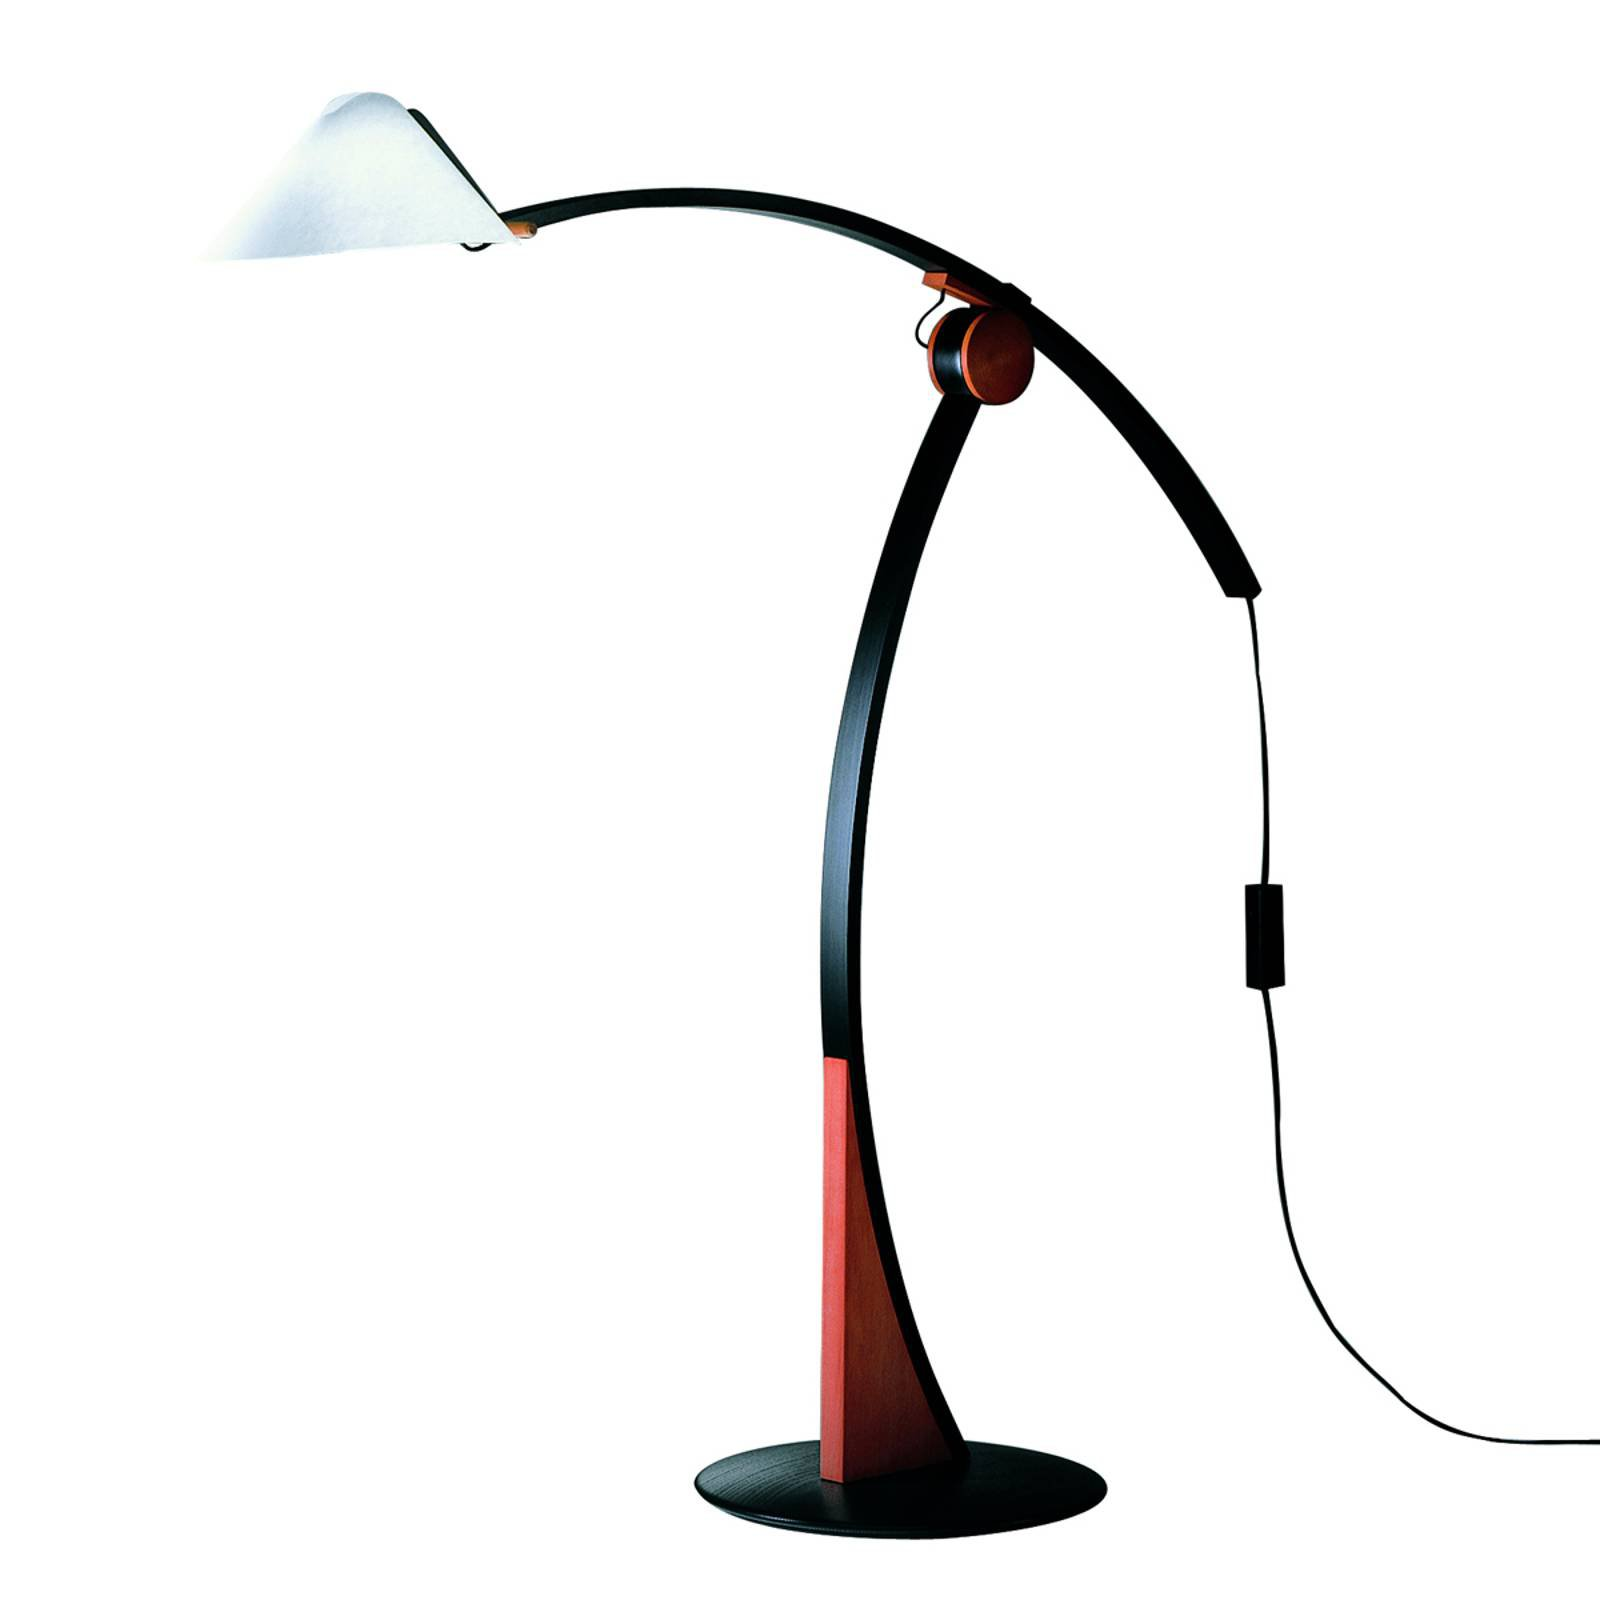 Gulvlampe Pollo E27 kirsebærfarget, svart dimbar